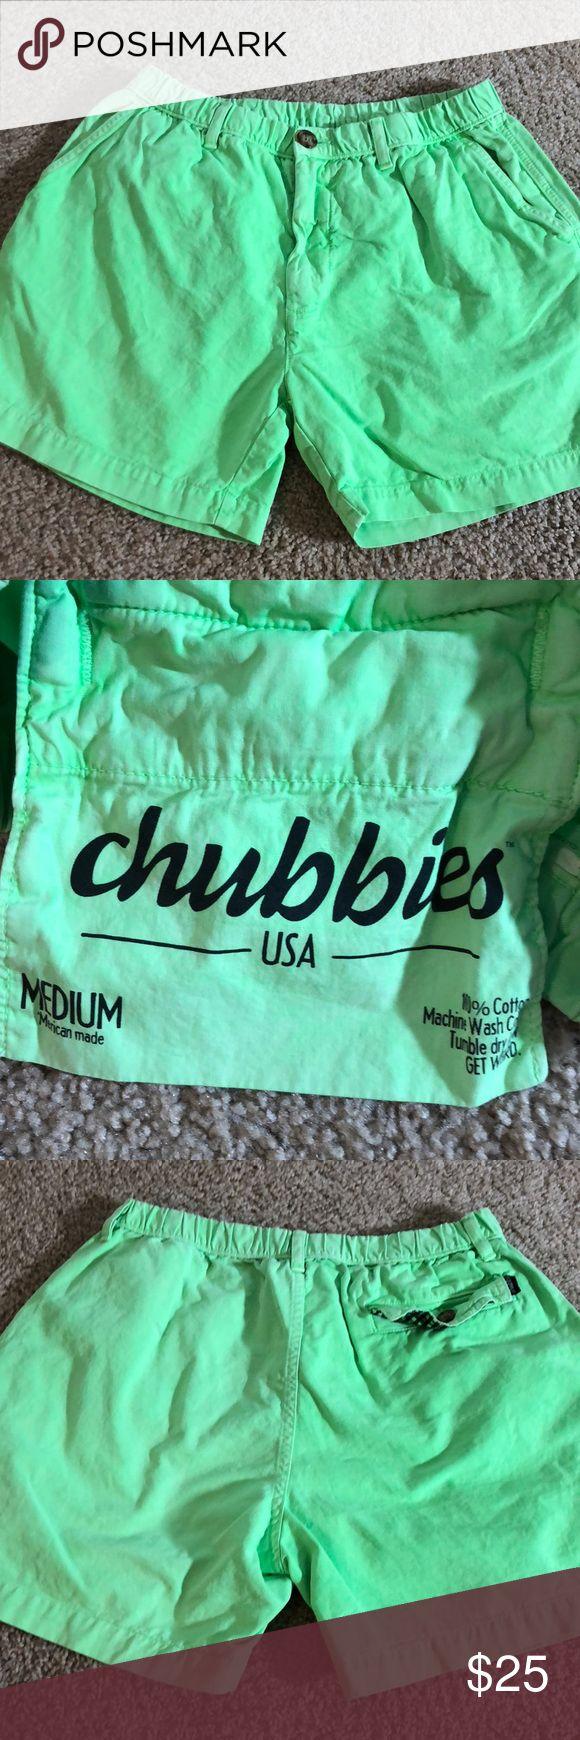 Men's chubbies lime green shorts size medium m Gently used size medium chubbies Shorts Flat Front